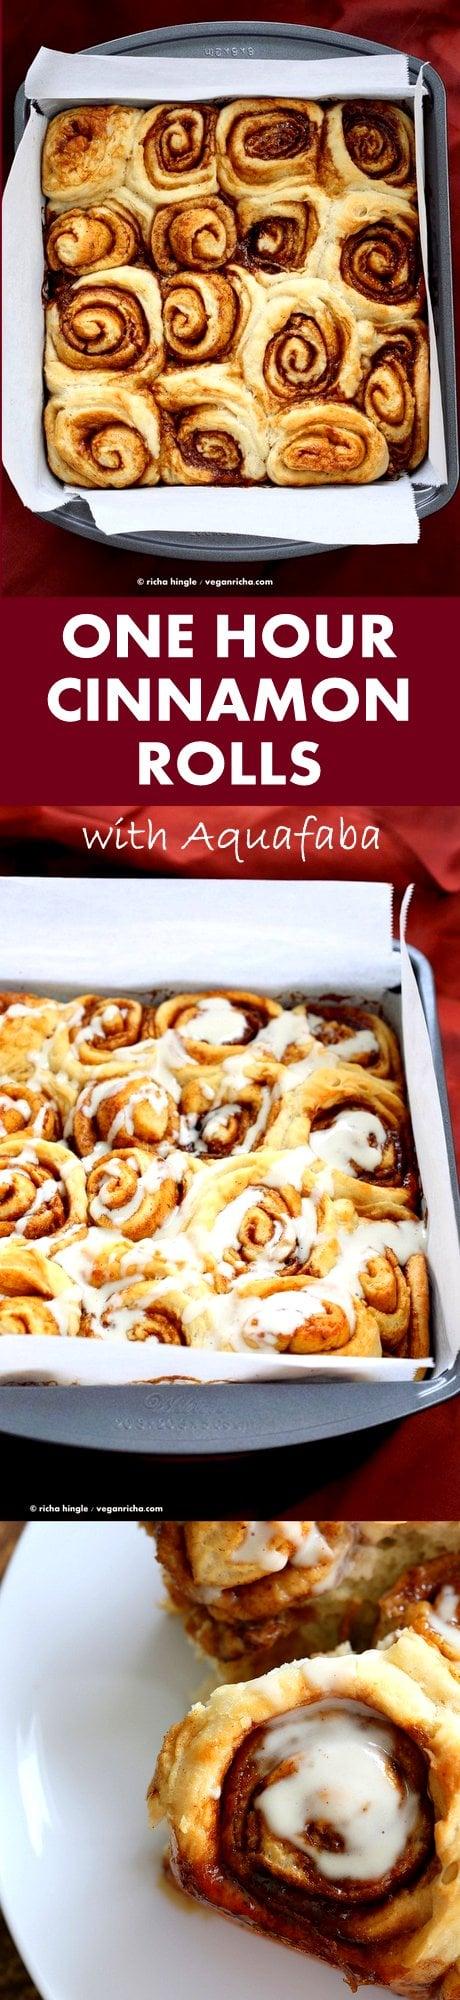 1 hour Cinnamon Rolls with Aquafaba. Easy Homemade Vegan Cinnamon Rolls with Cashew cream frosting. Ready in 60 minutes. #Vegan #Soyfree #PalmOilfree #Breakfast #Recipe | VeganRicha.com